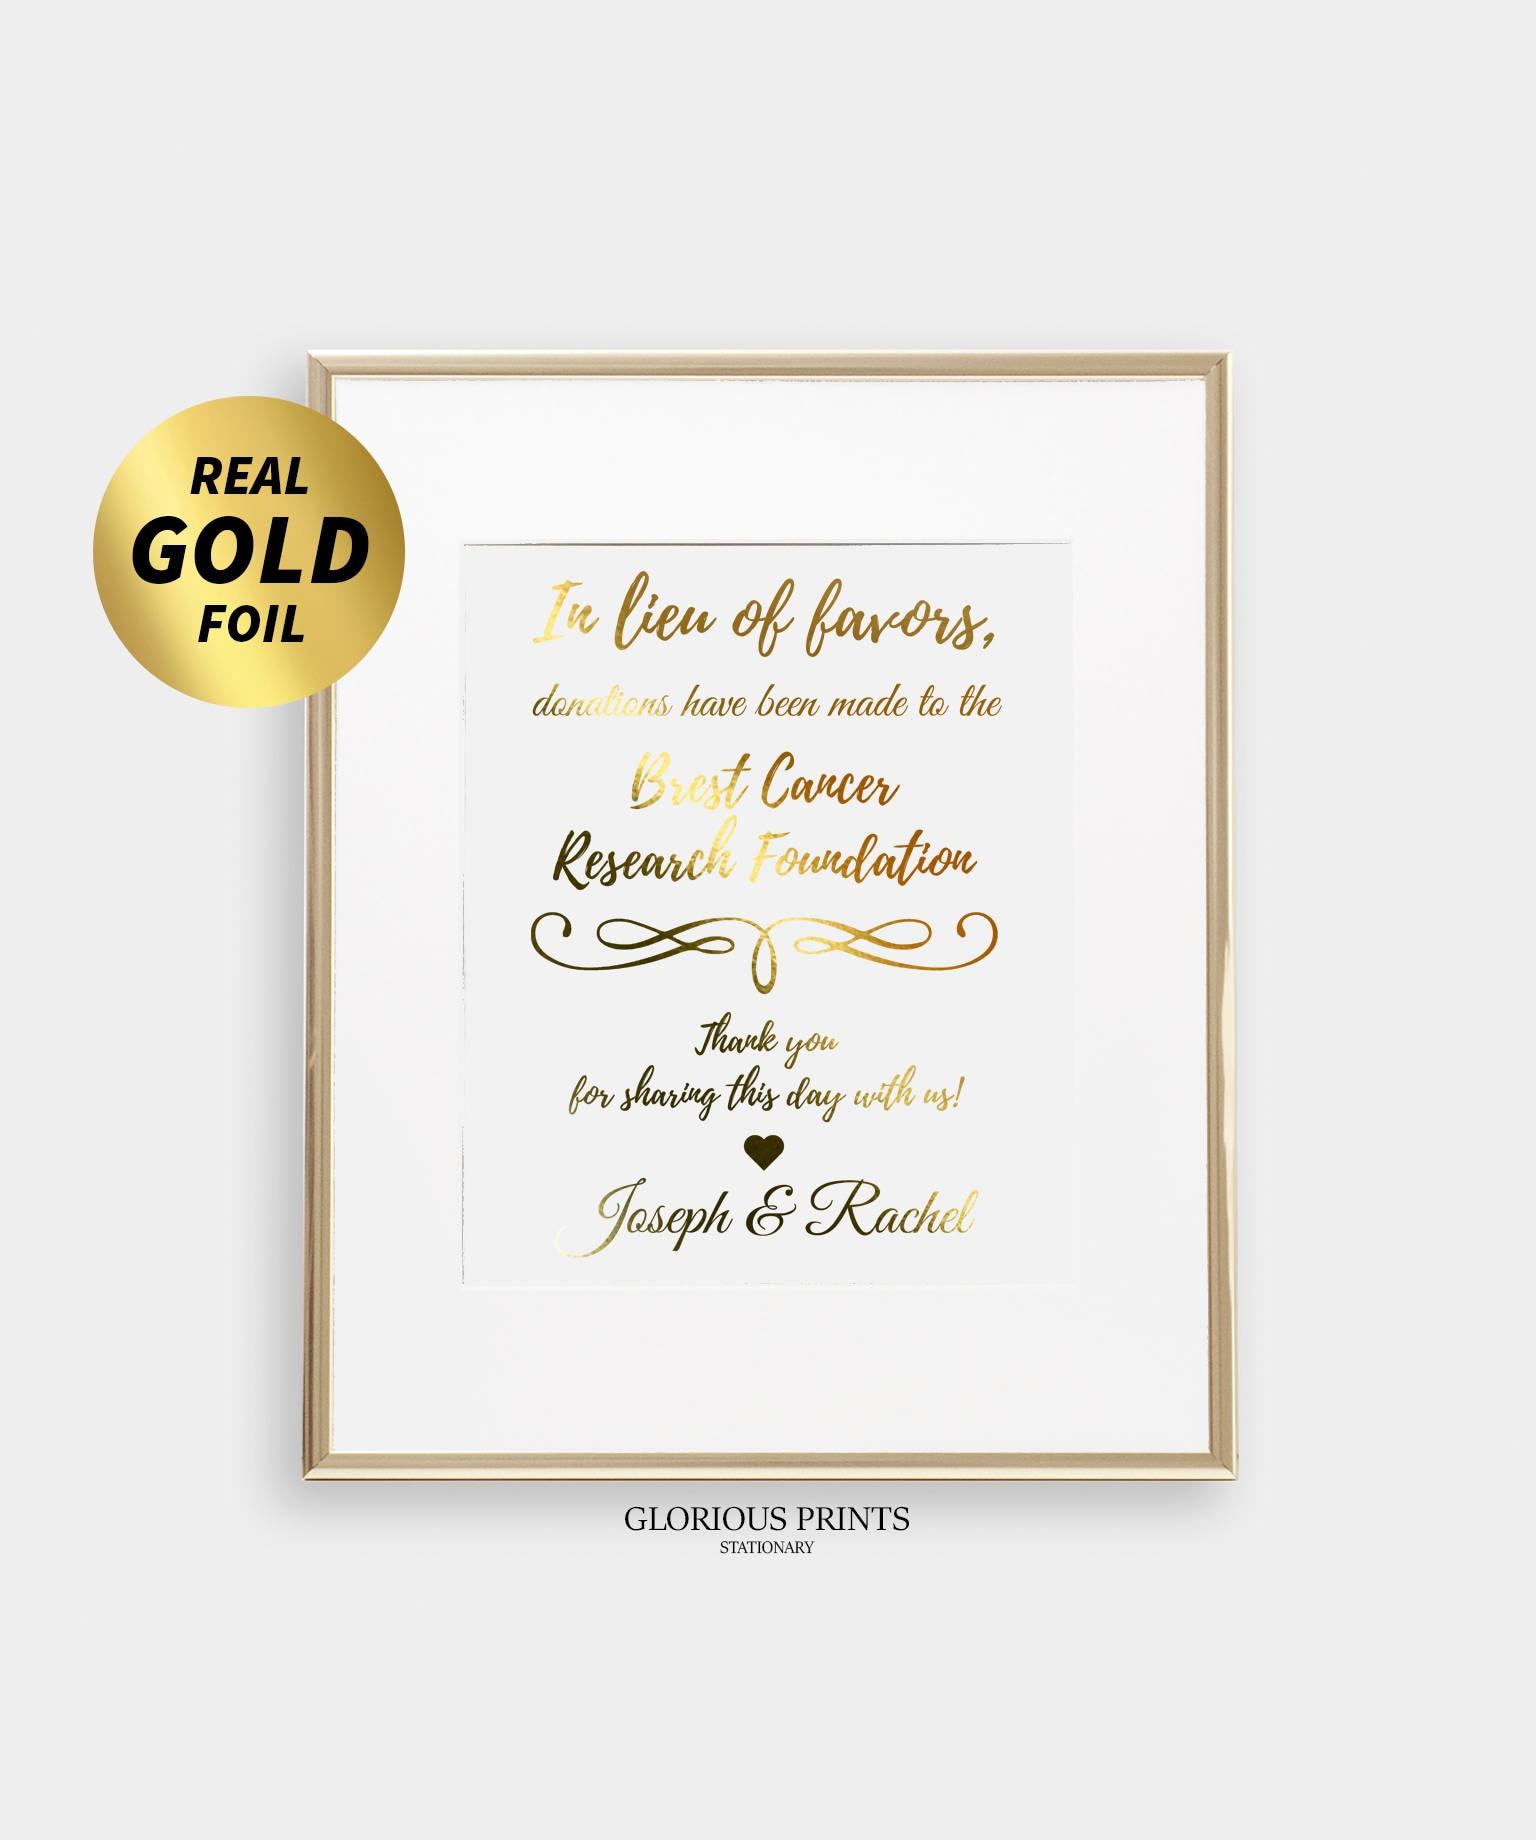 Custom Wedding Favors Sign In Lieu Of Favors Sign Gold Foil